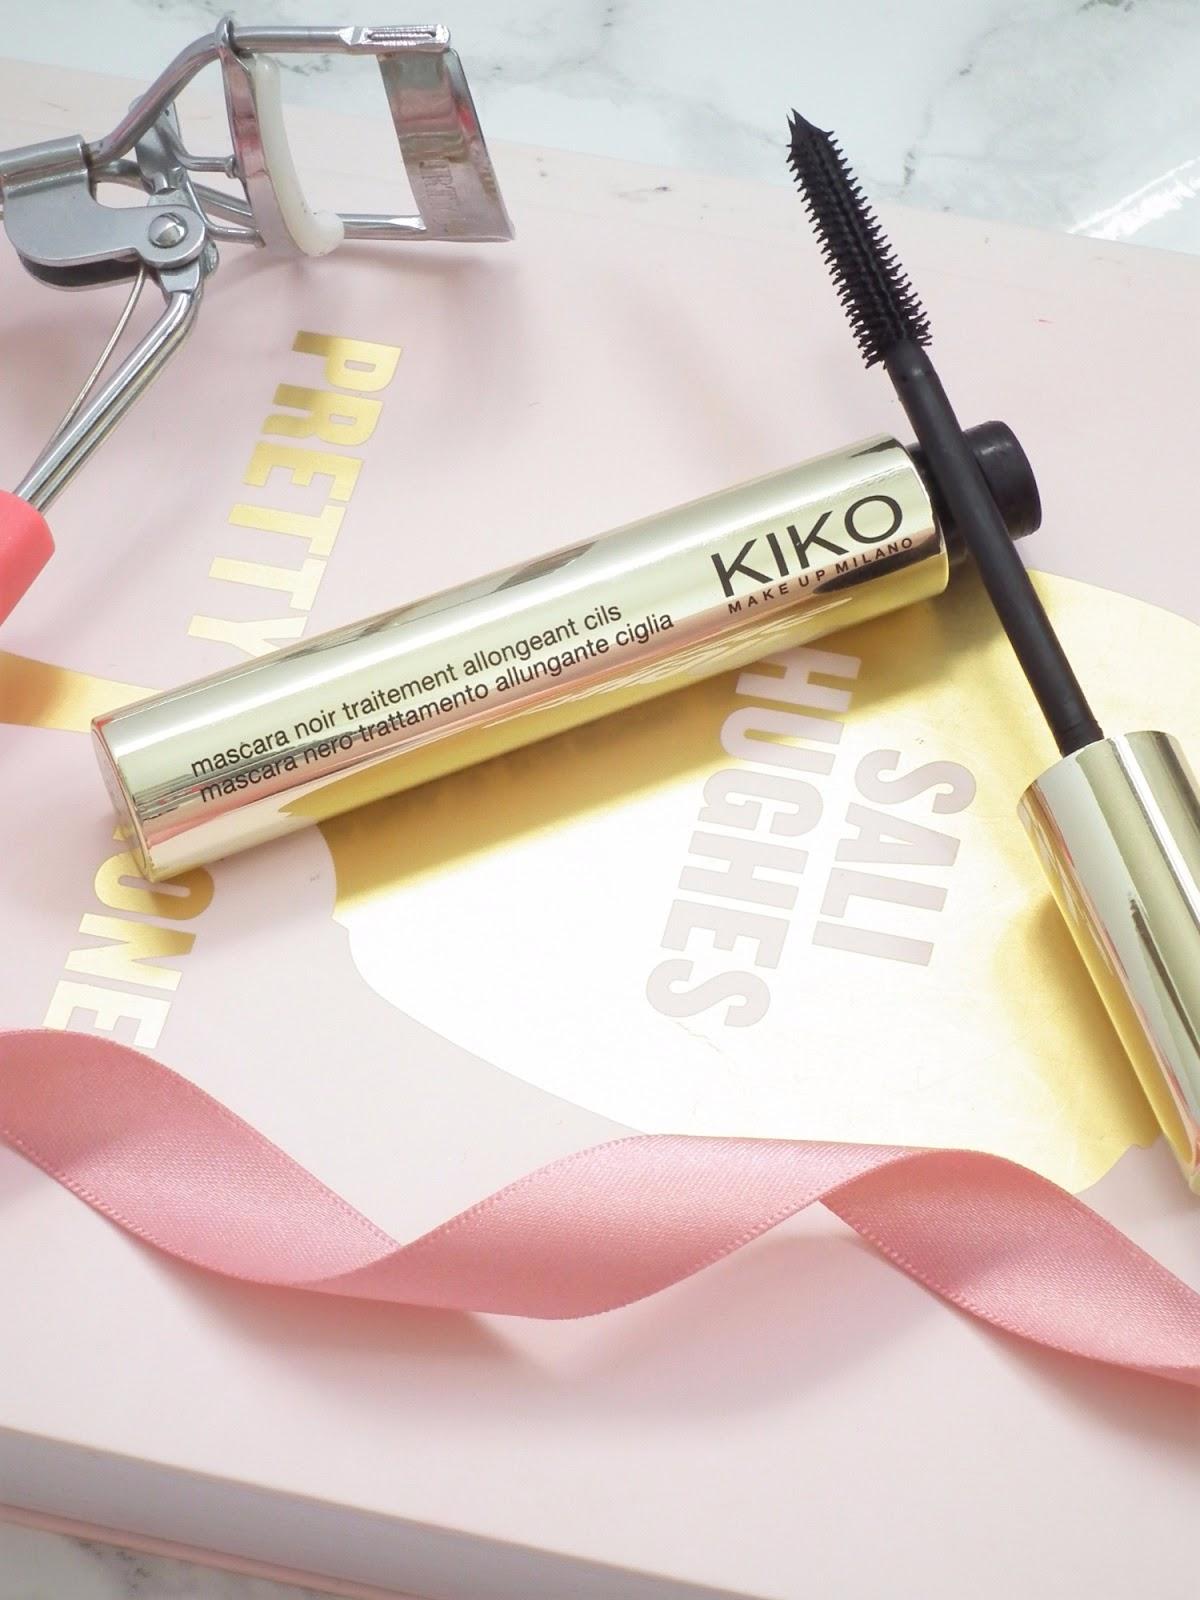 Kiko 30 Days Mascara Treatment - Does It Work?